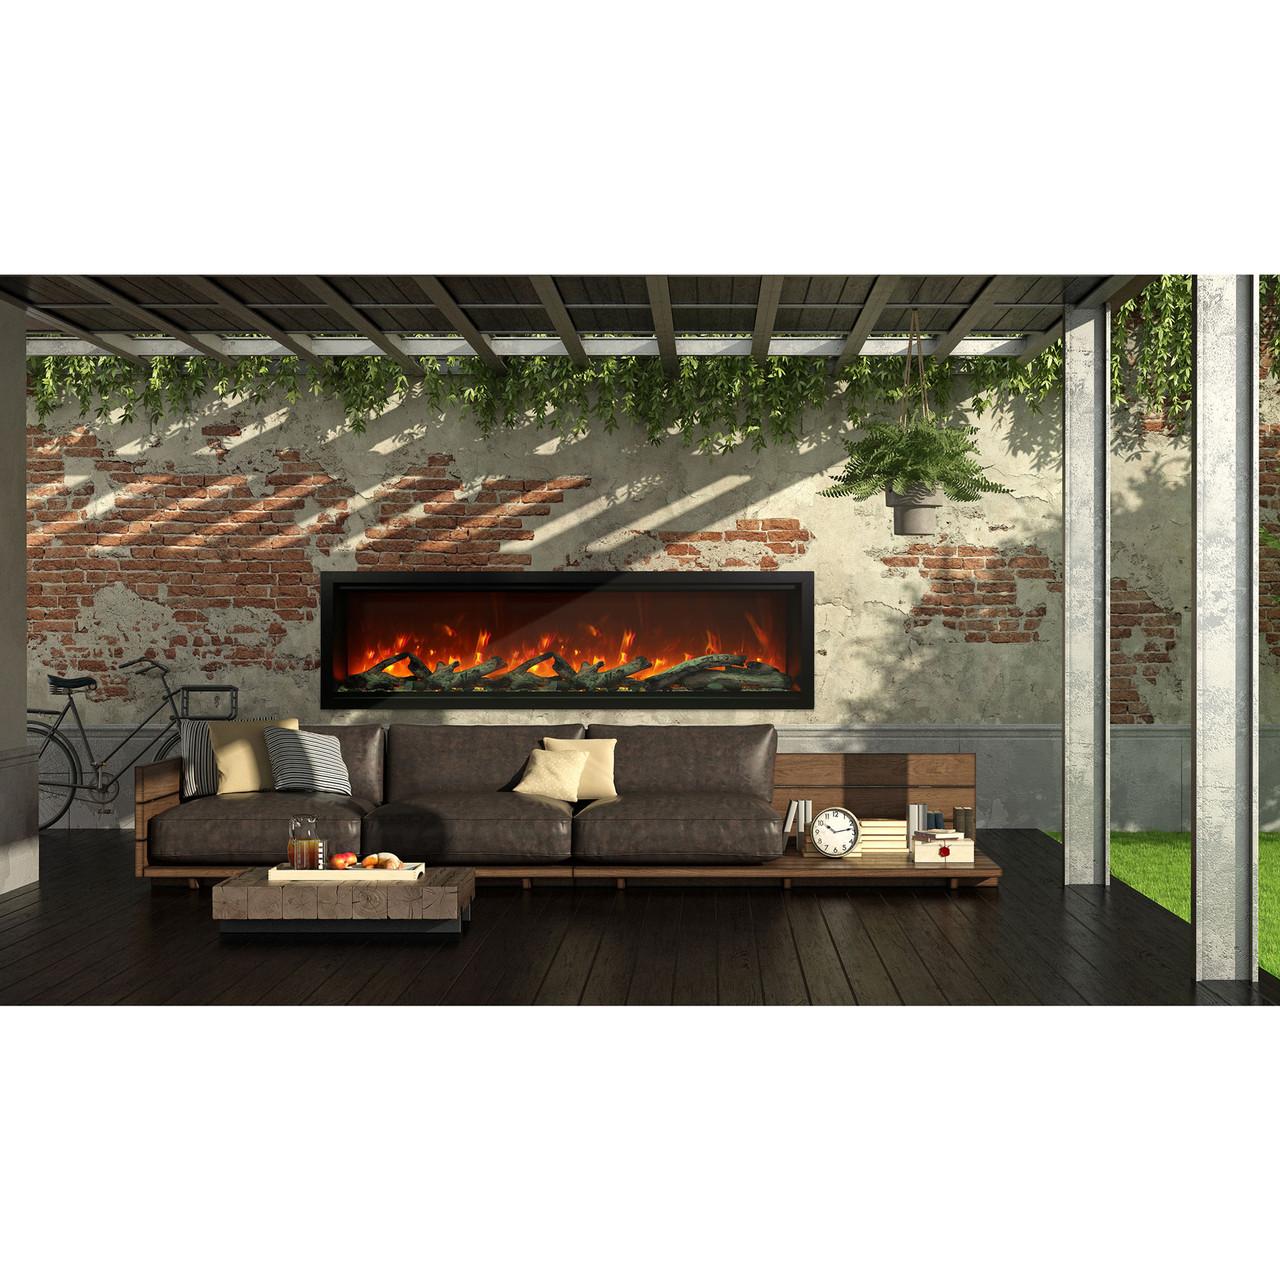 74 symmetry xt series linear electric fireplace amantii